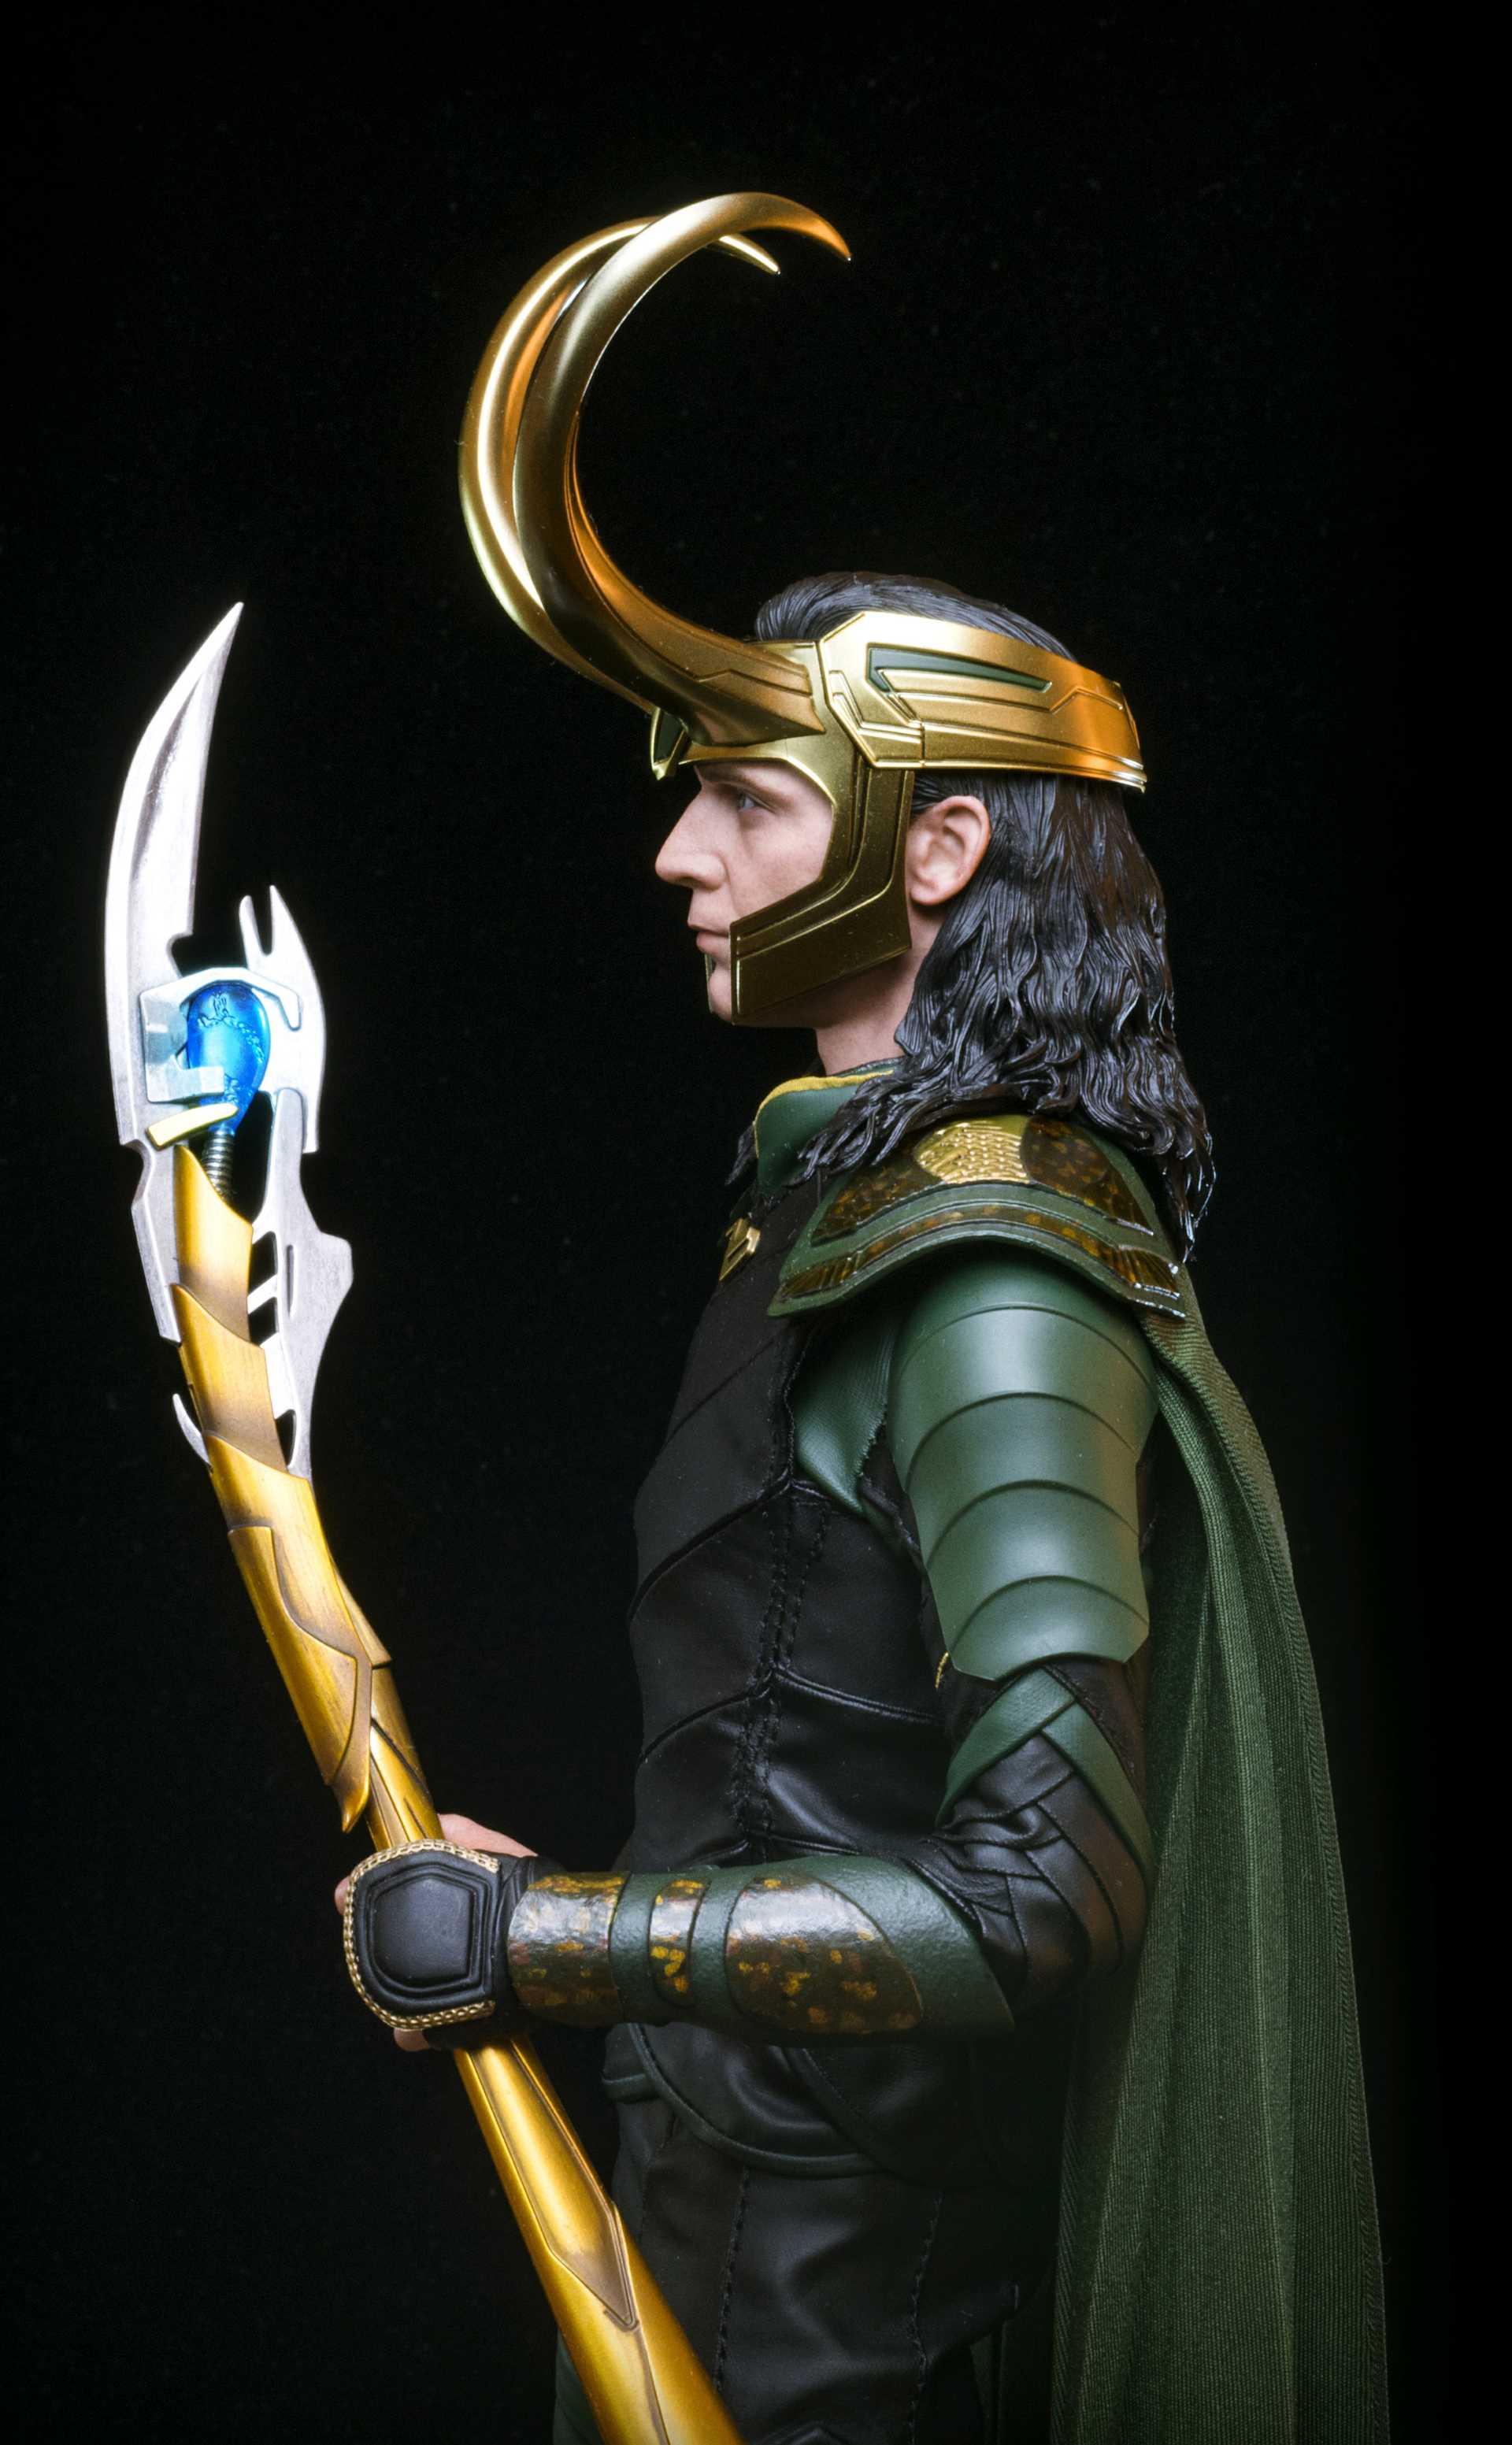 Hot Toys Loki Marvel 1/6 Scale Action Figure | Figround